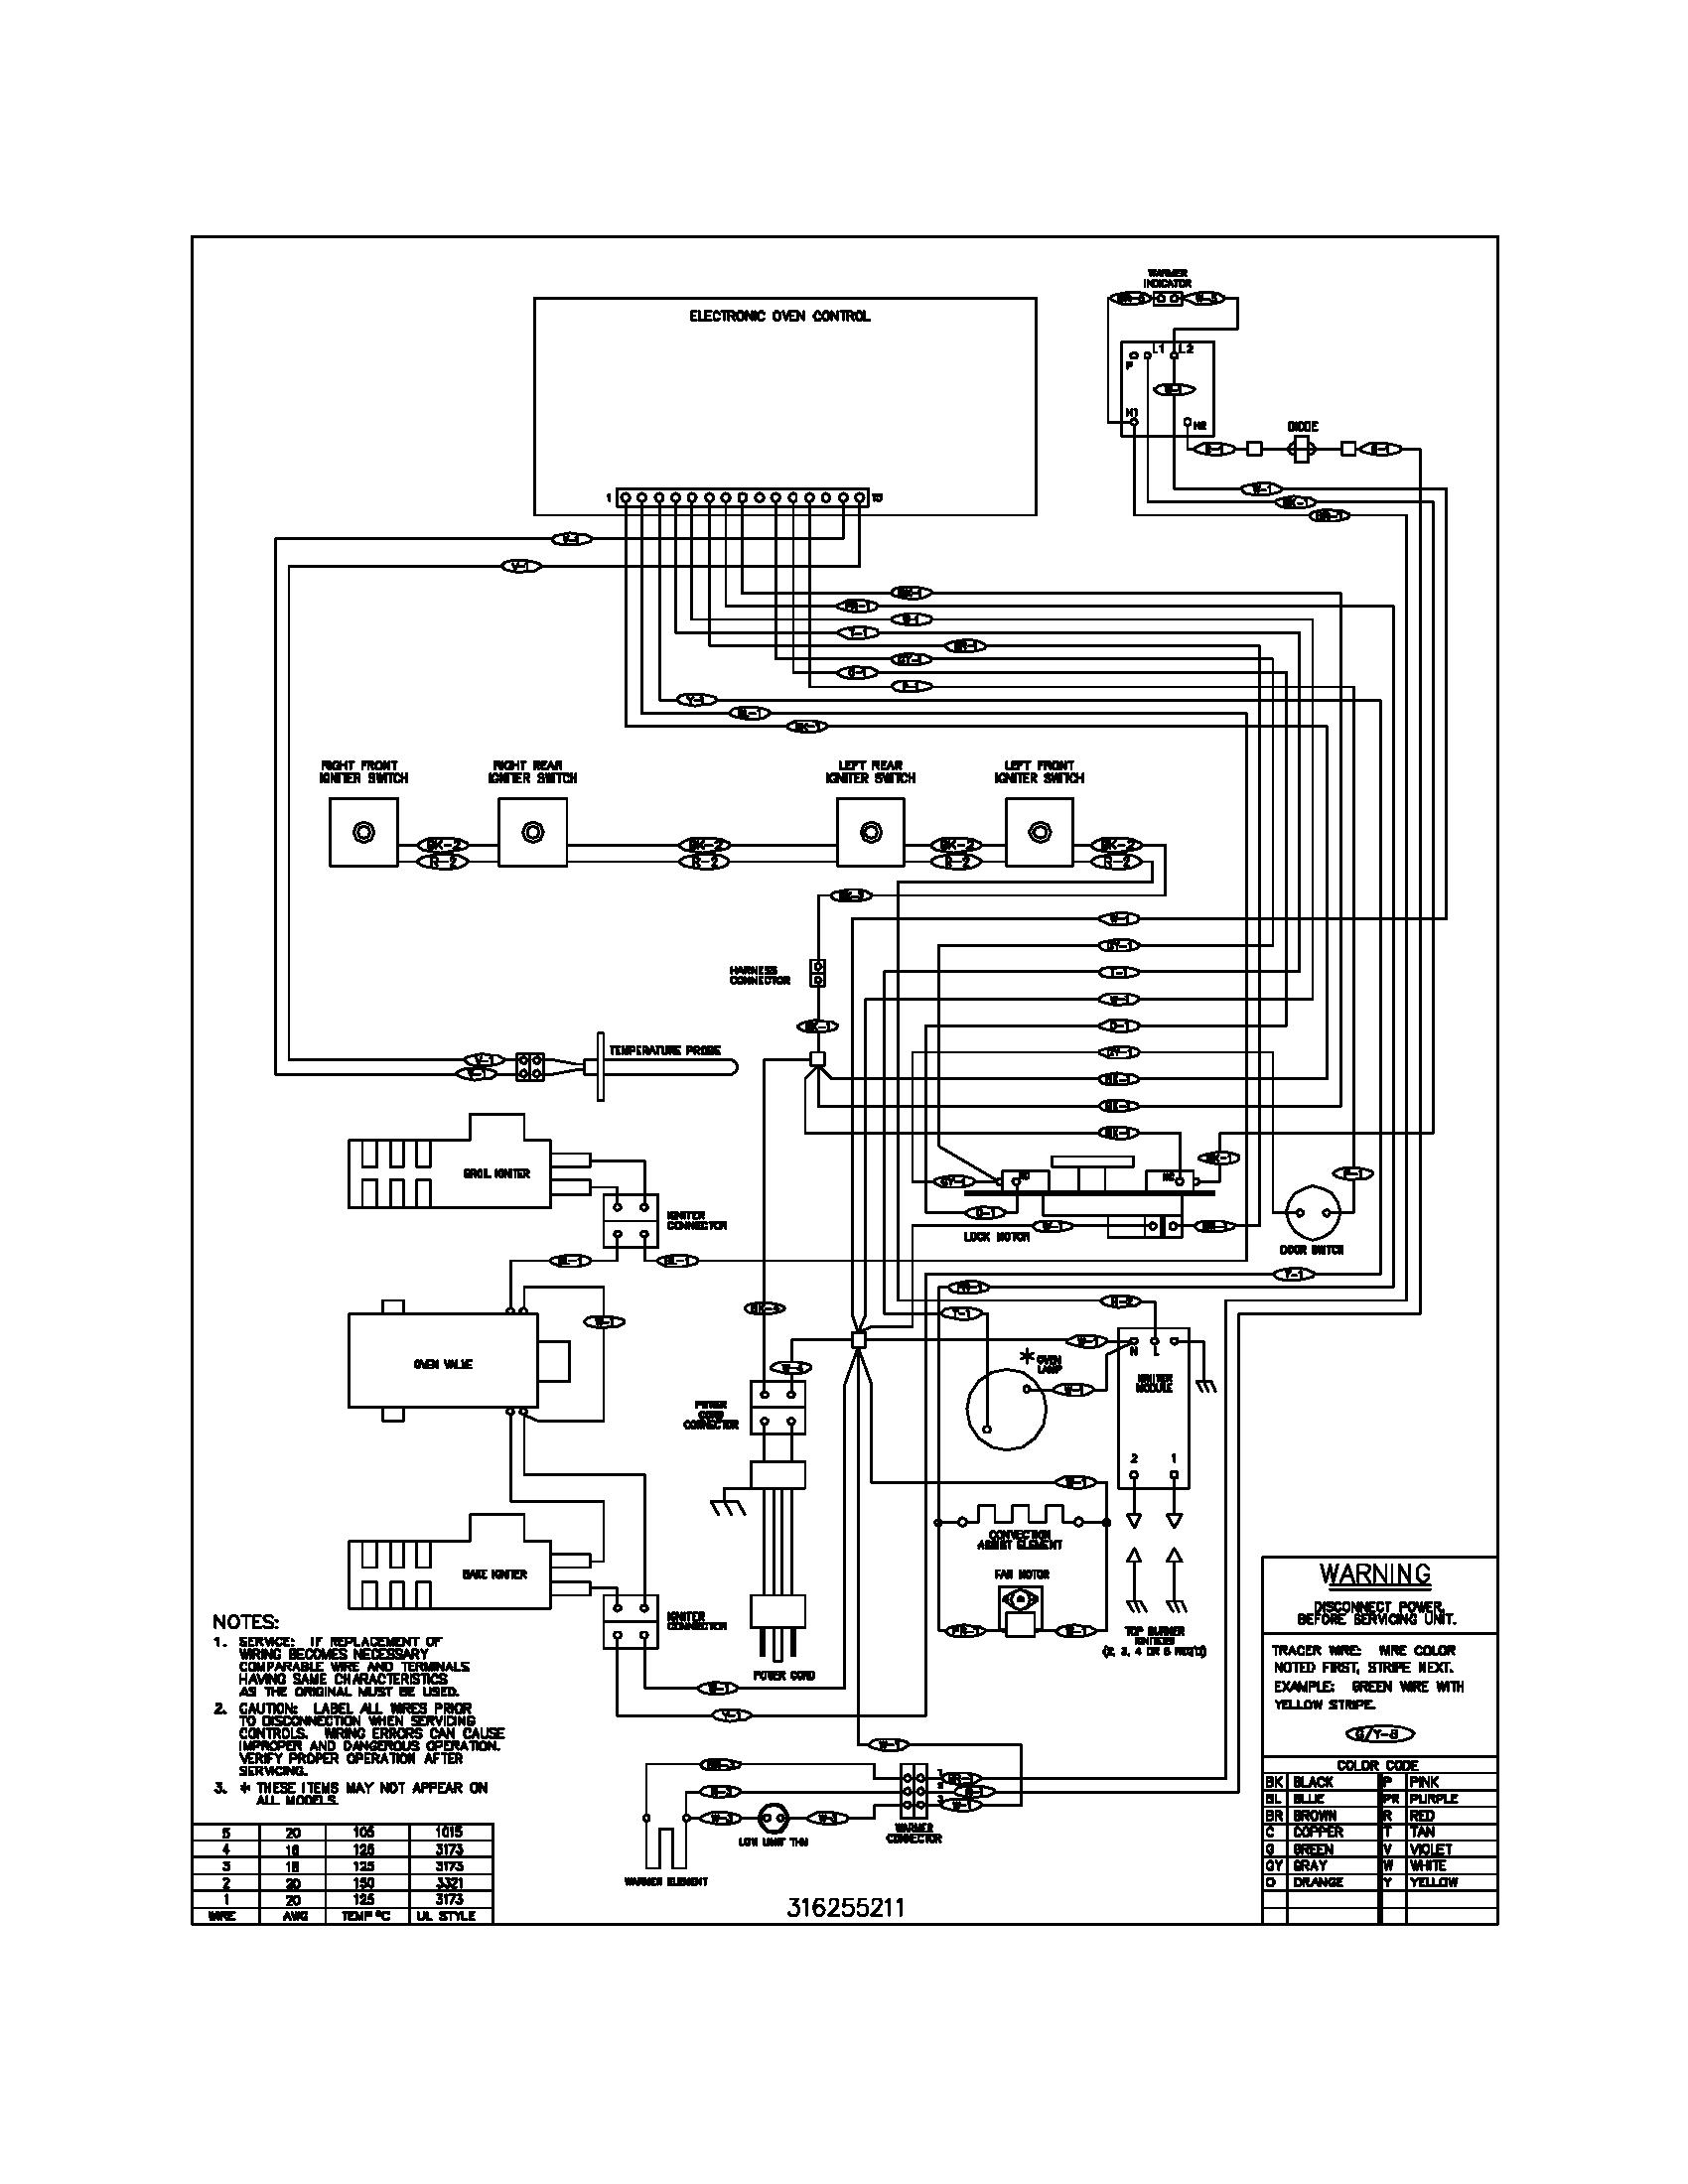 wiring diagram parts?resize\\\=665%2C861\\\&ssl\\\=1 trailer furnace wiring diagram on trailer images free download Gas Heater Wiring Diagram at soozxer.org